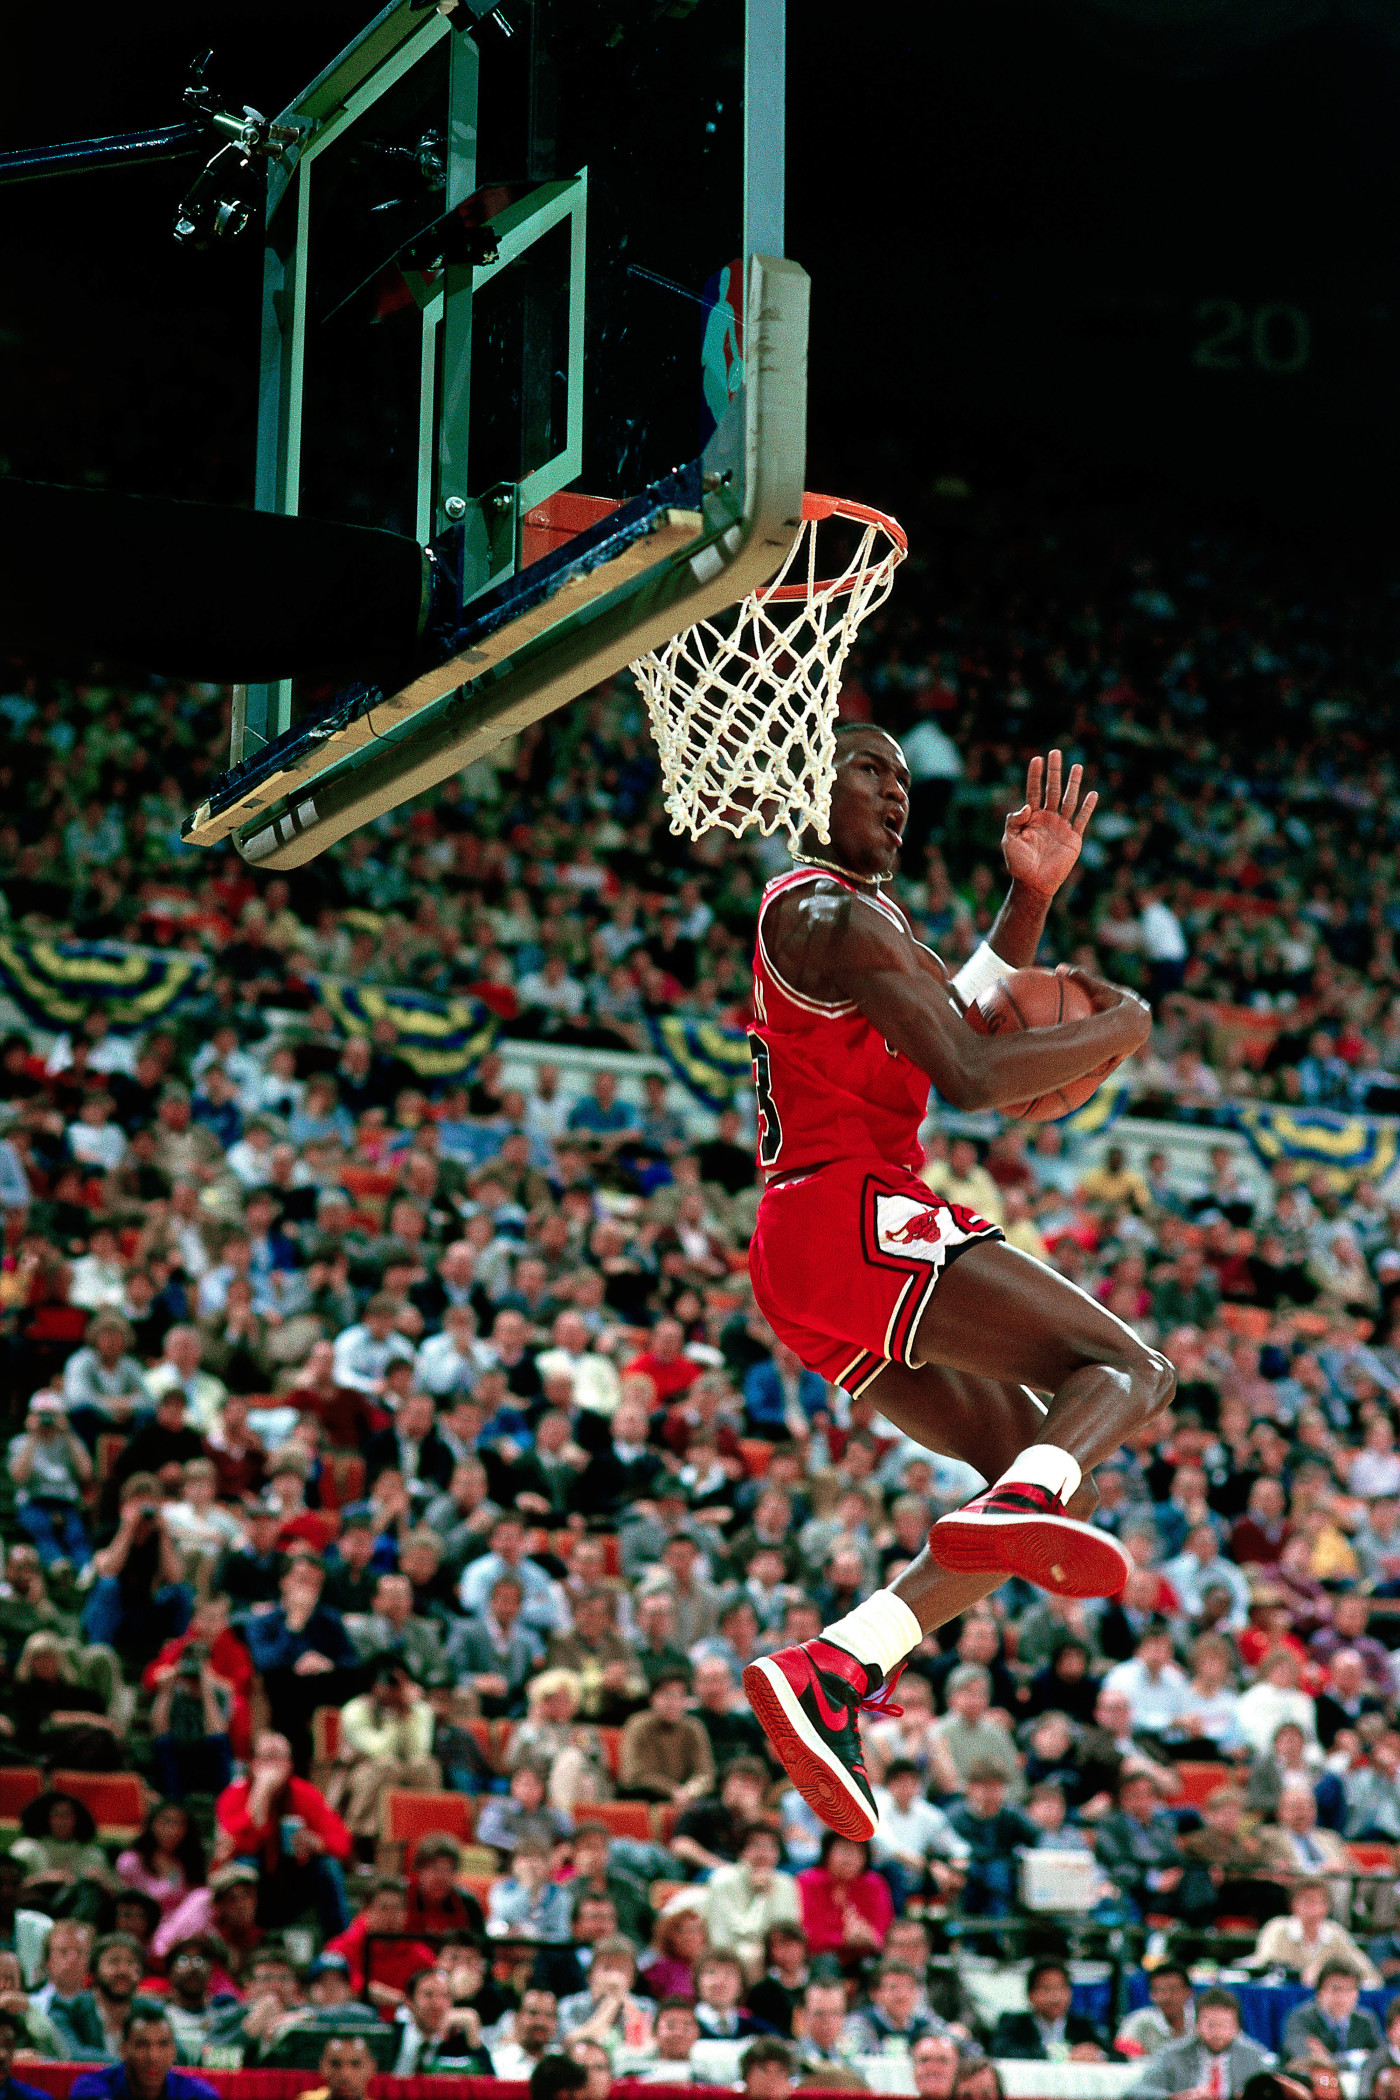 Michael Jordan 1985 Dunk Contest